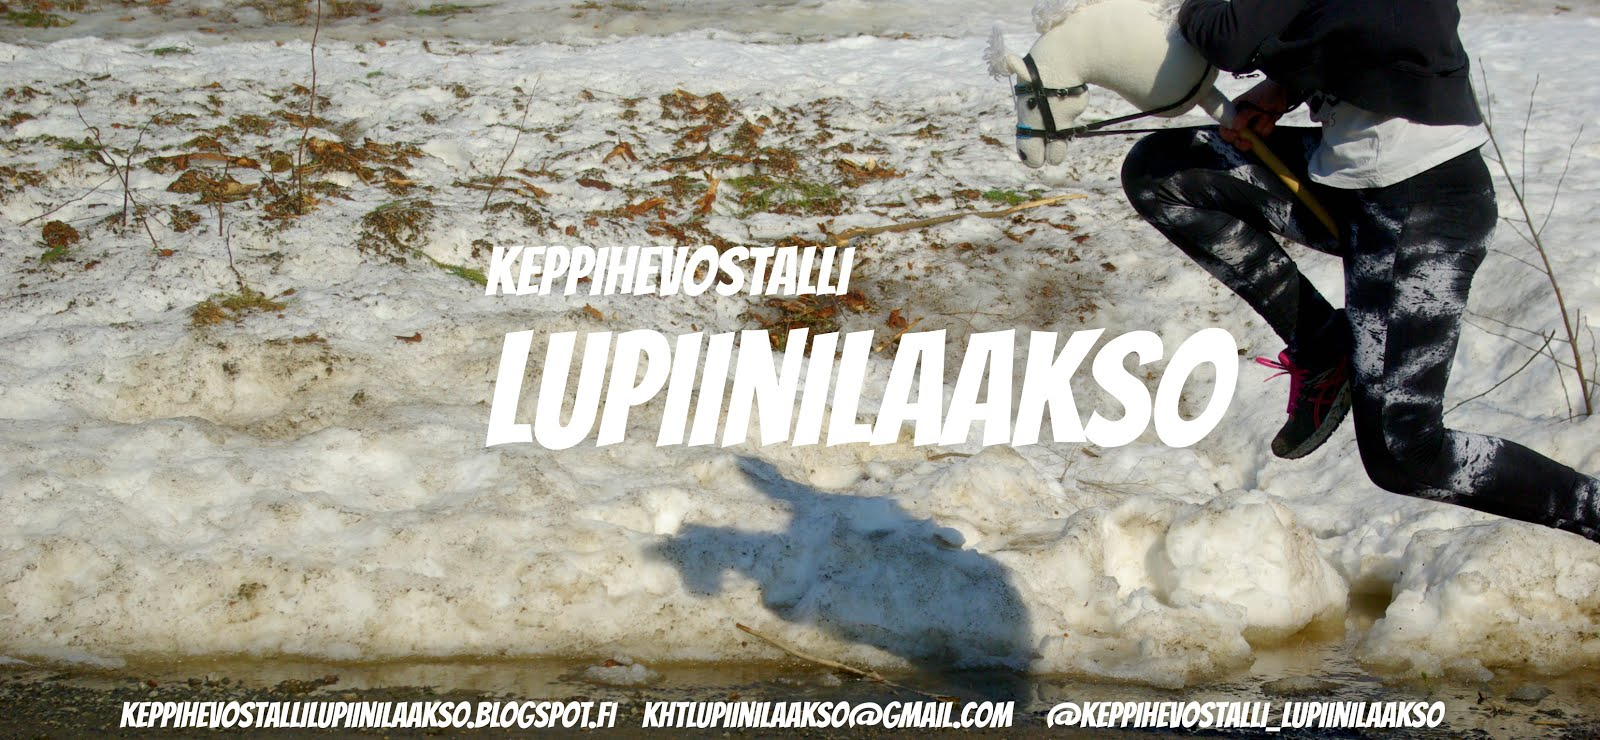 Keppihevostalli Lupiinilaakso